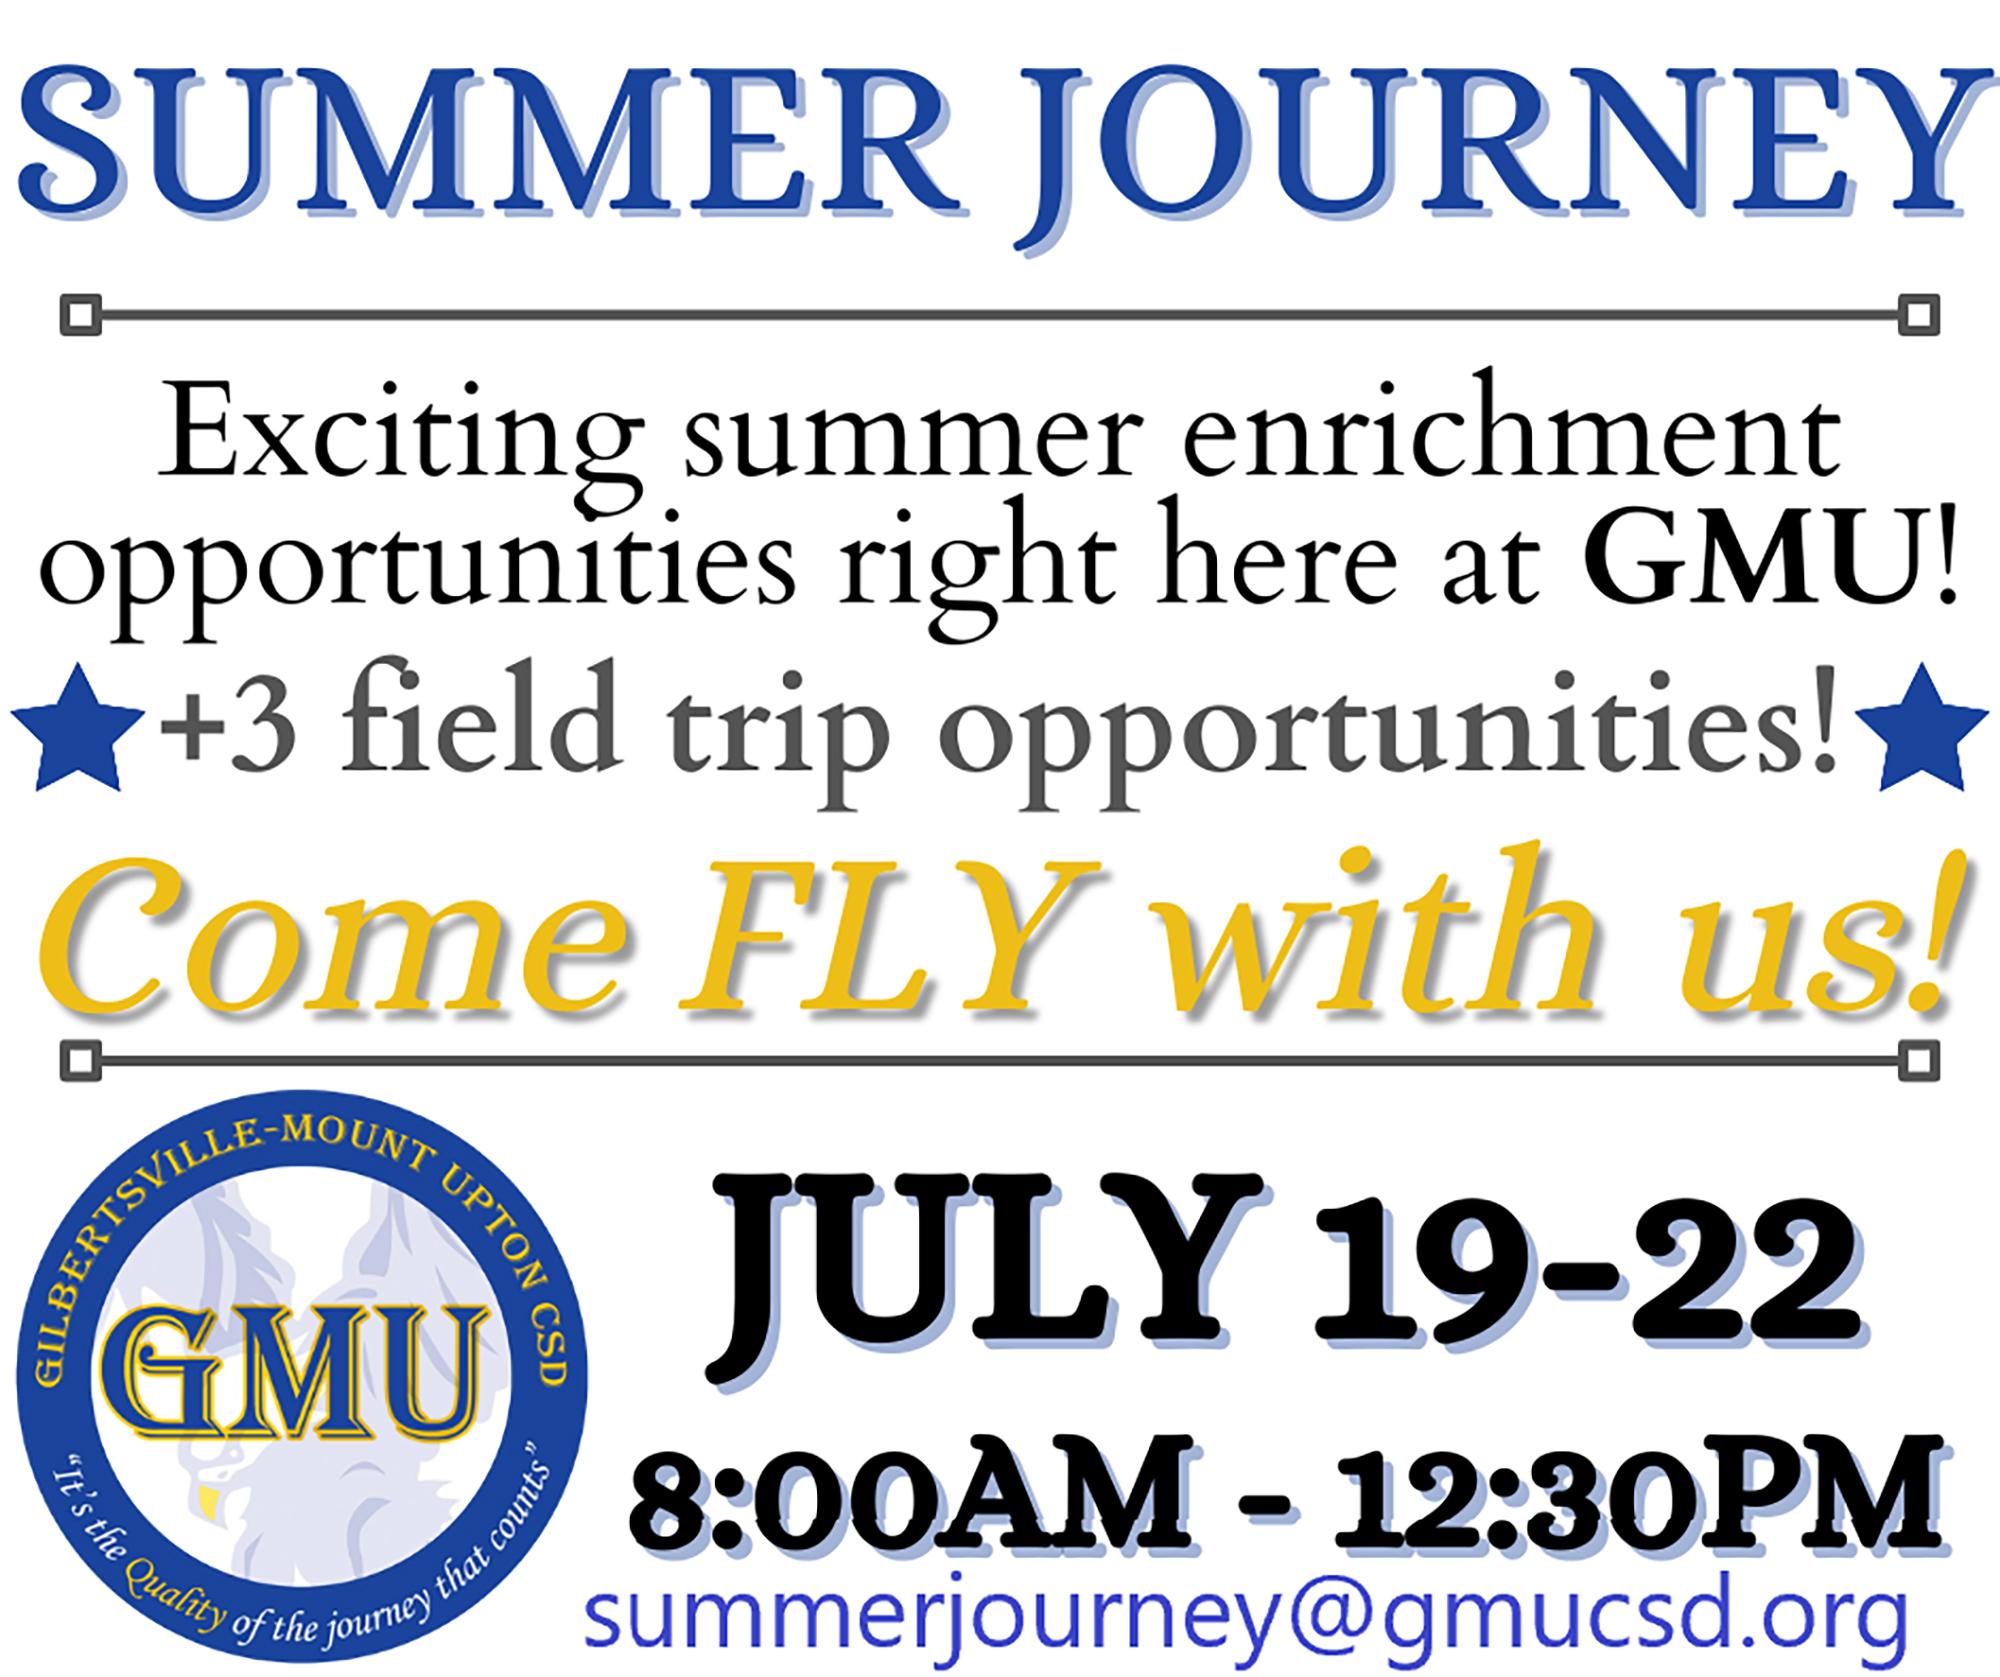 Summer Journey flyer (6/2021)